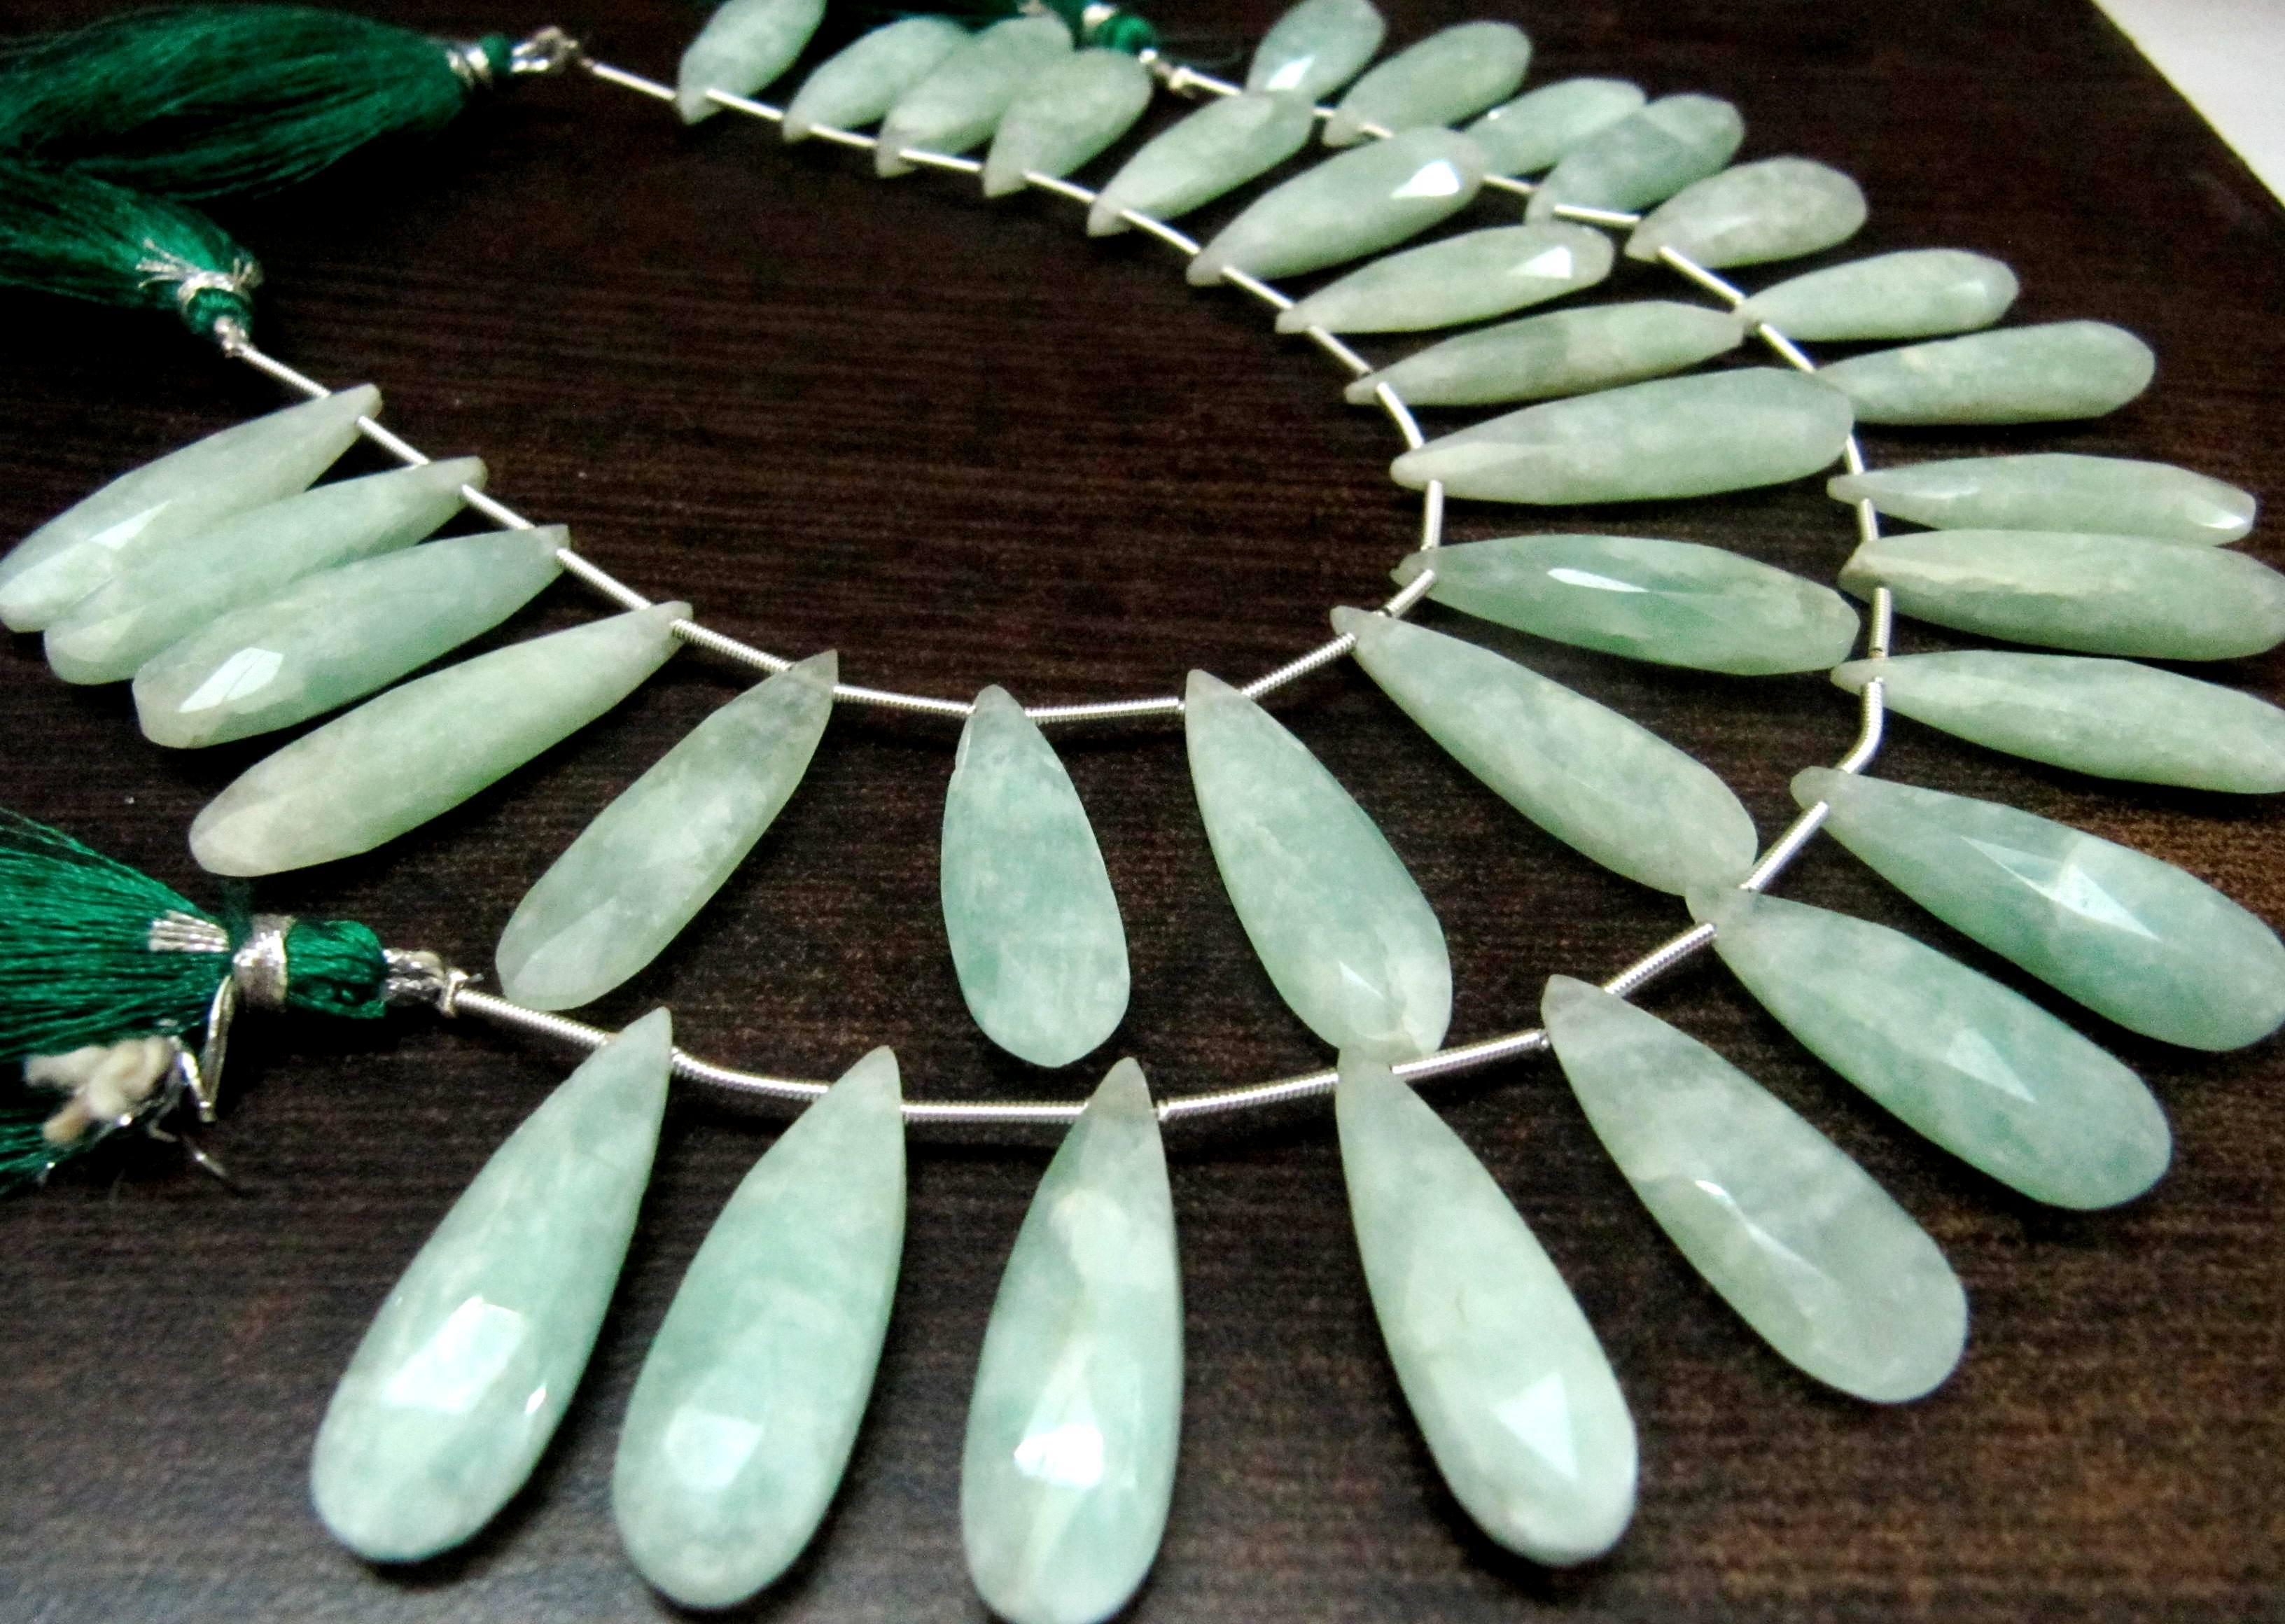 Natural Moonstone Russian Amazonite Pear Shape Jewelry Making Beads